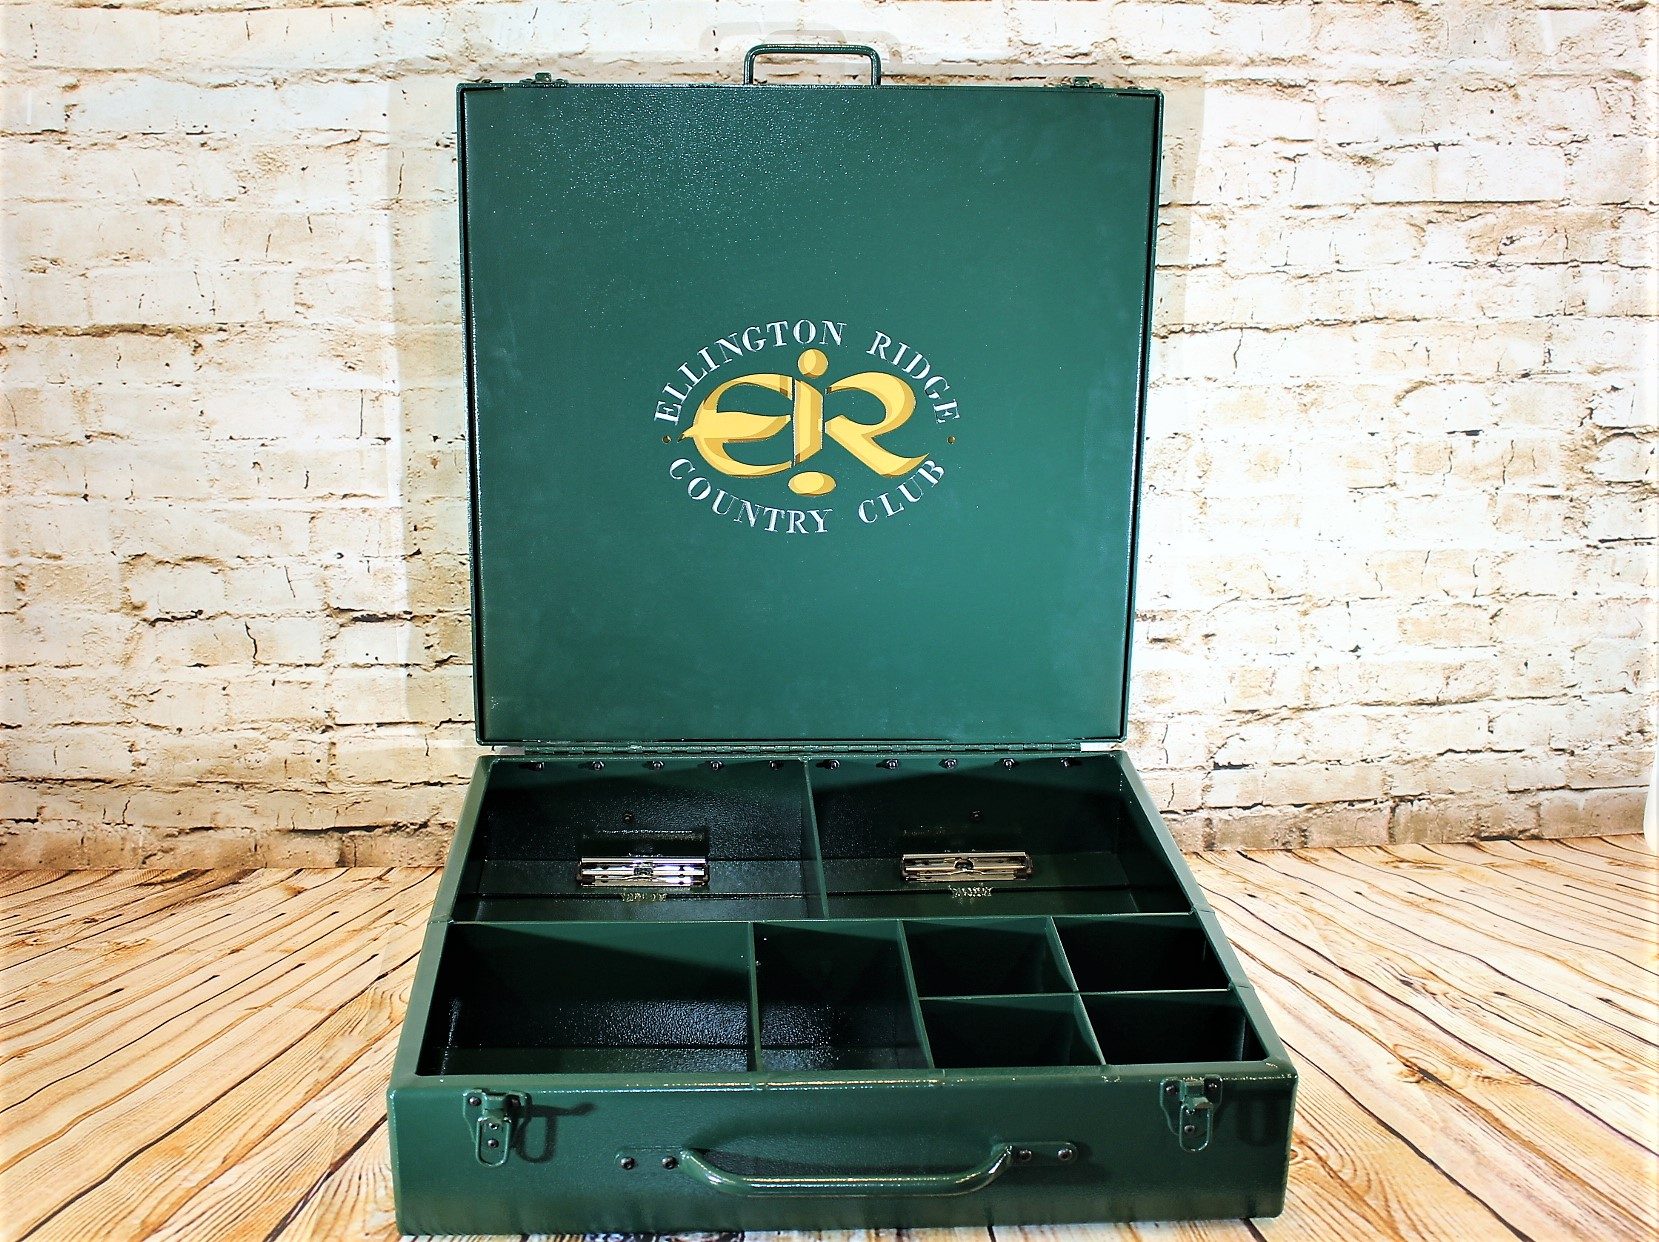 Tournament Cases -Ellington Ridge Country Club